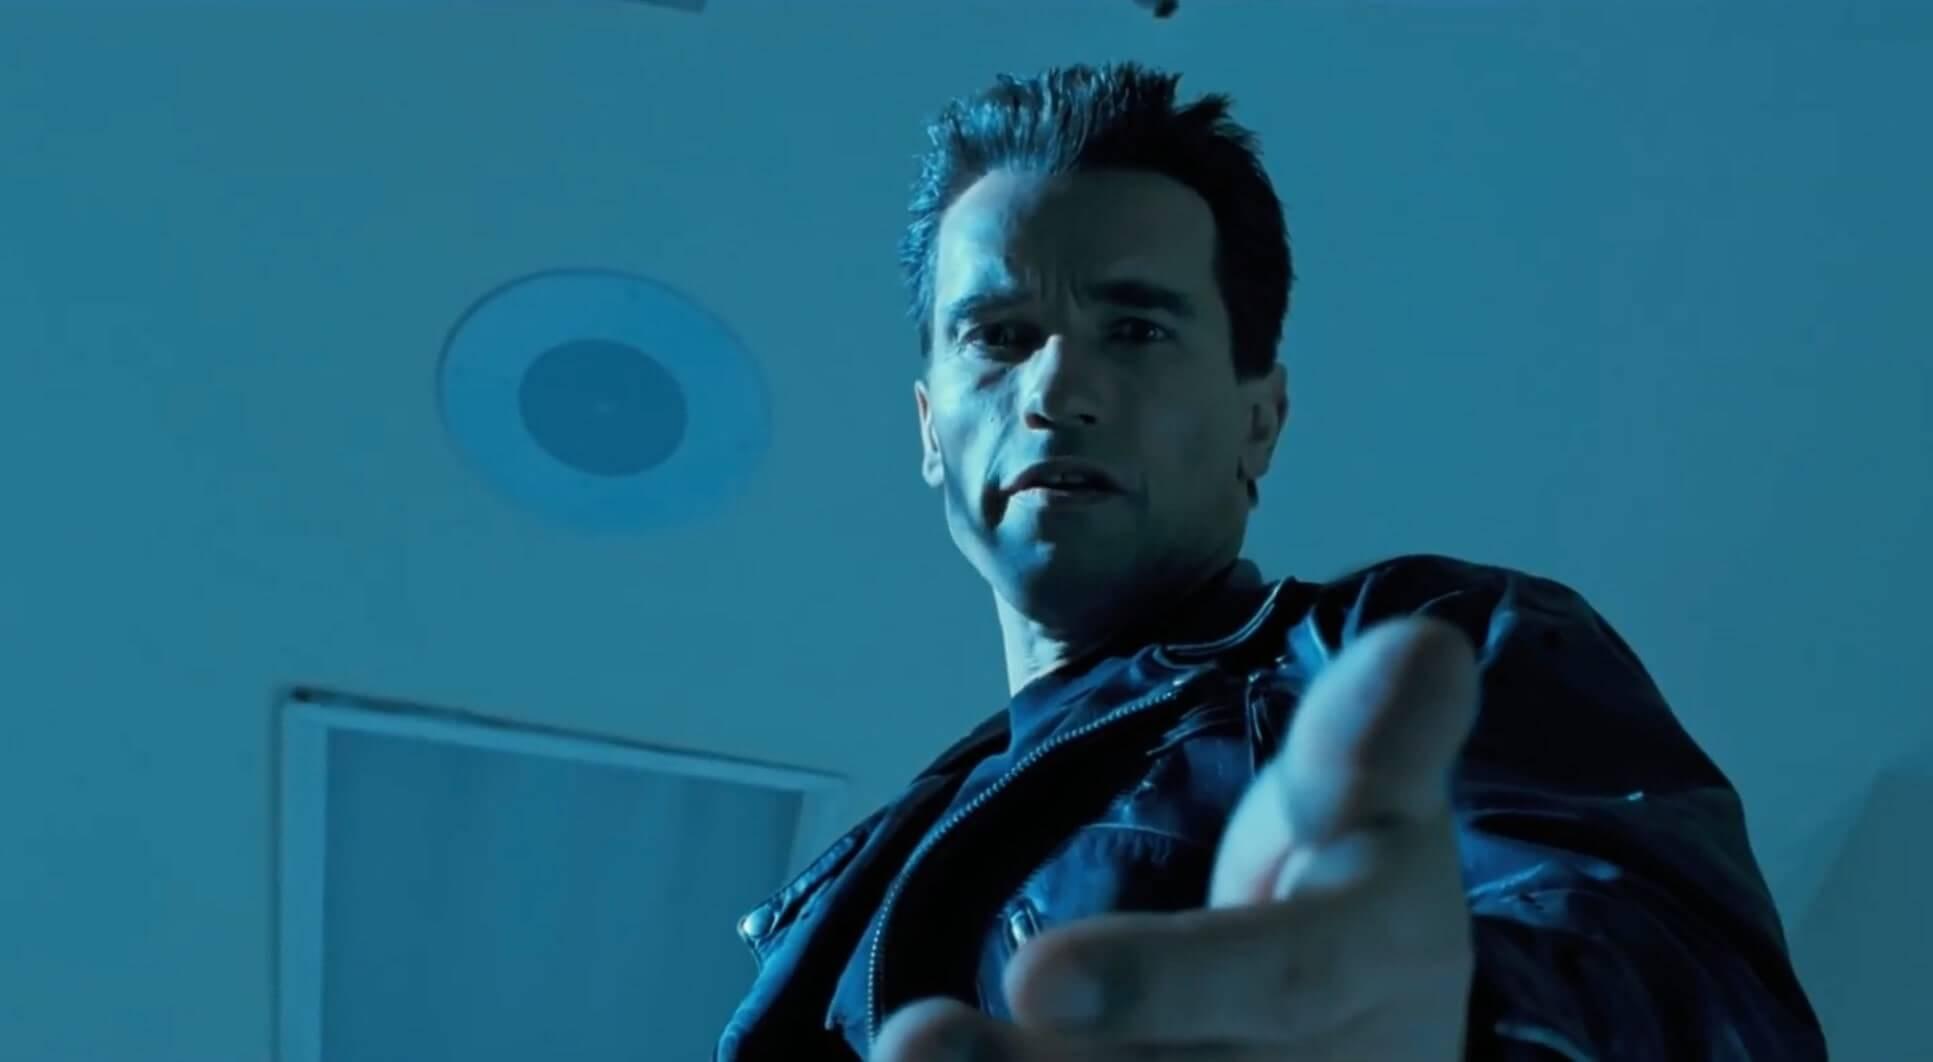 Branding Strategies - Online Presence Like Terminator 2